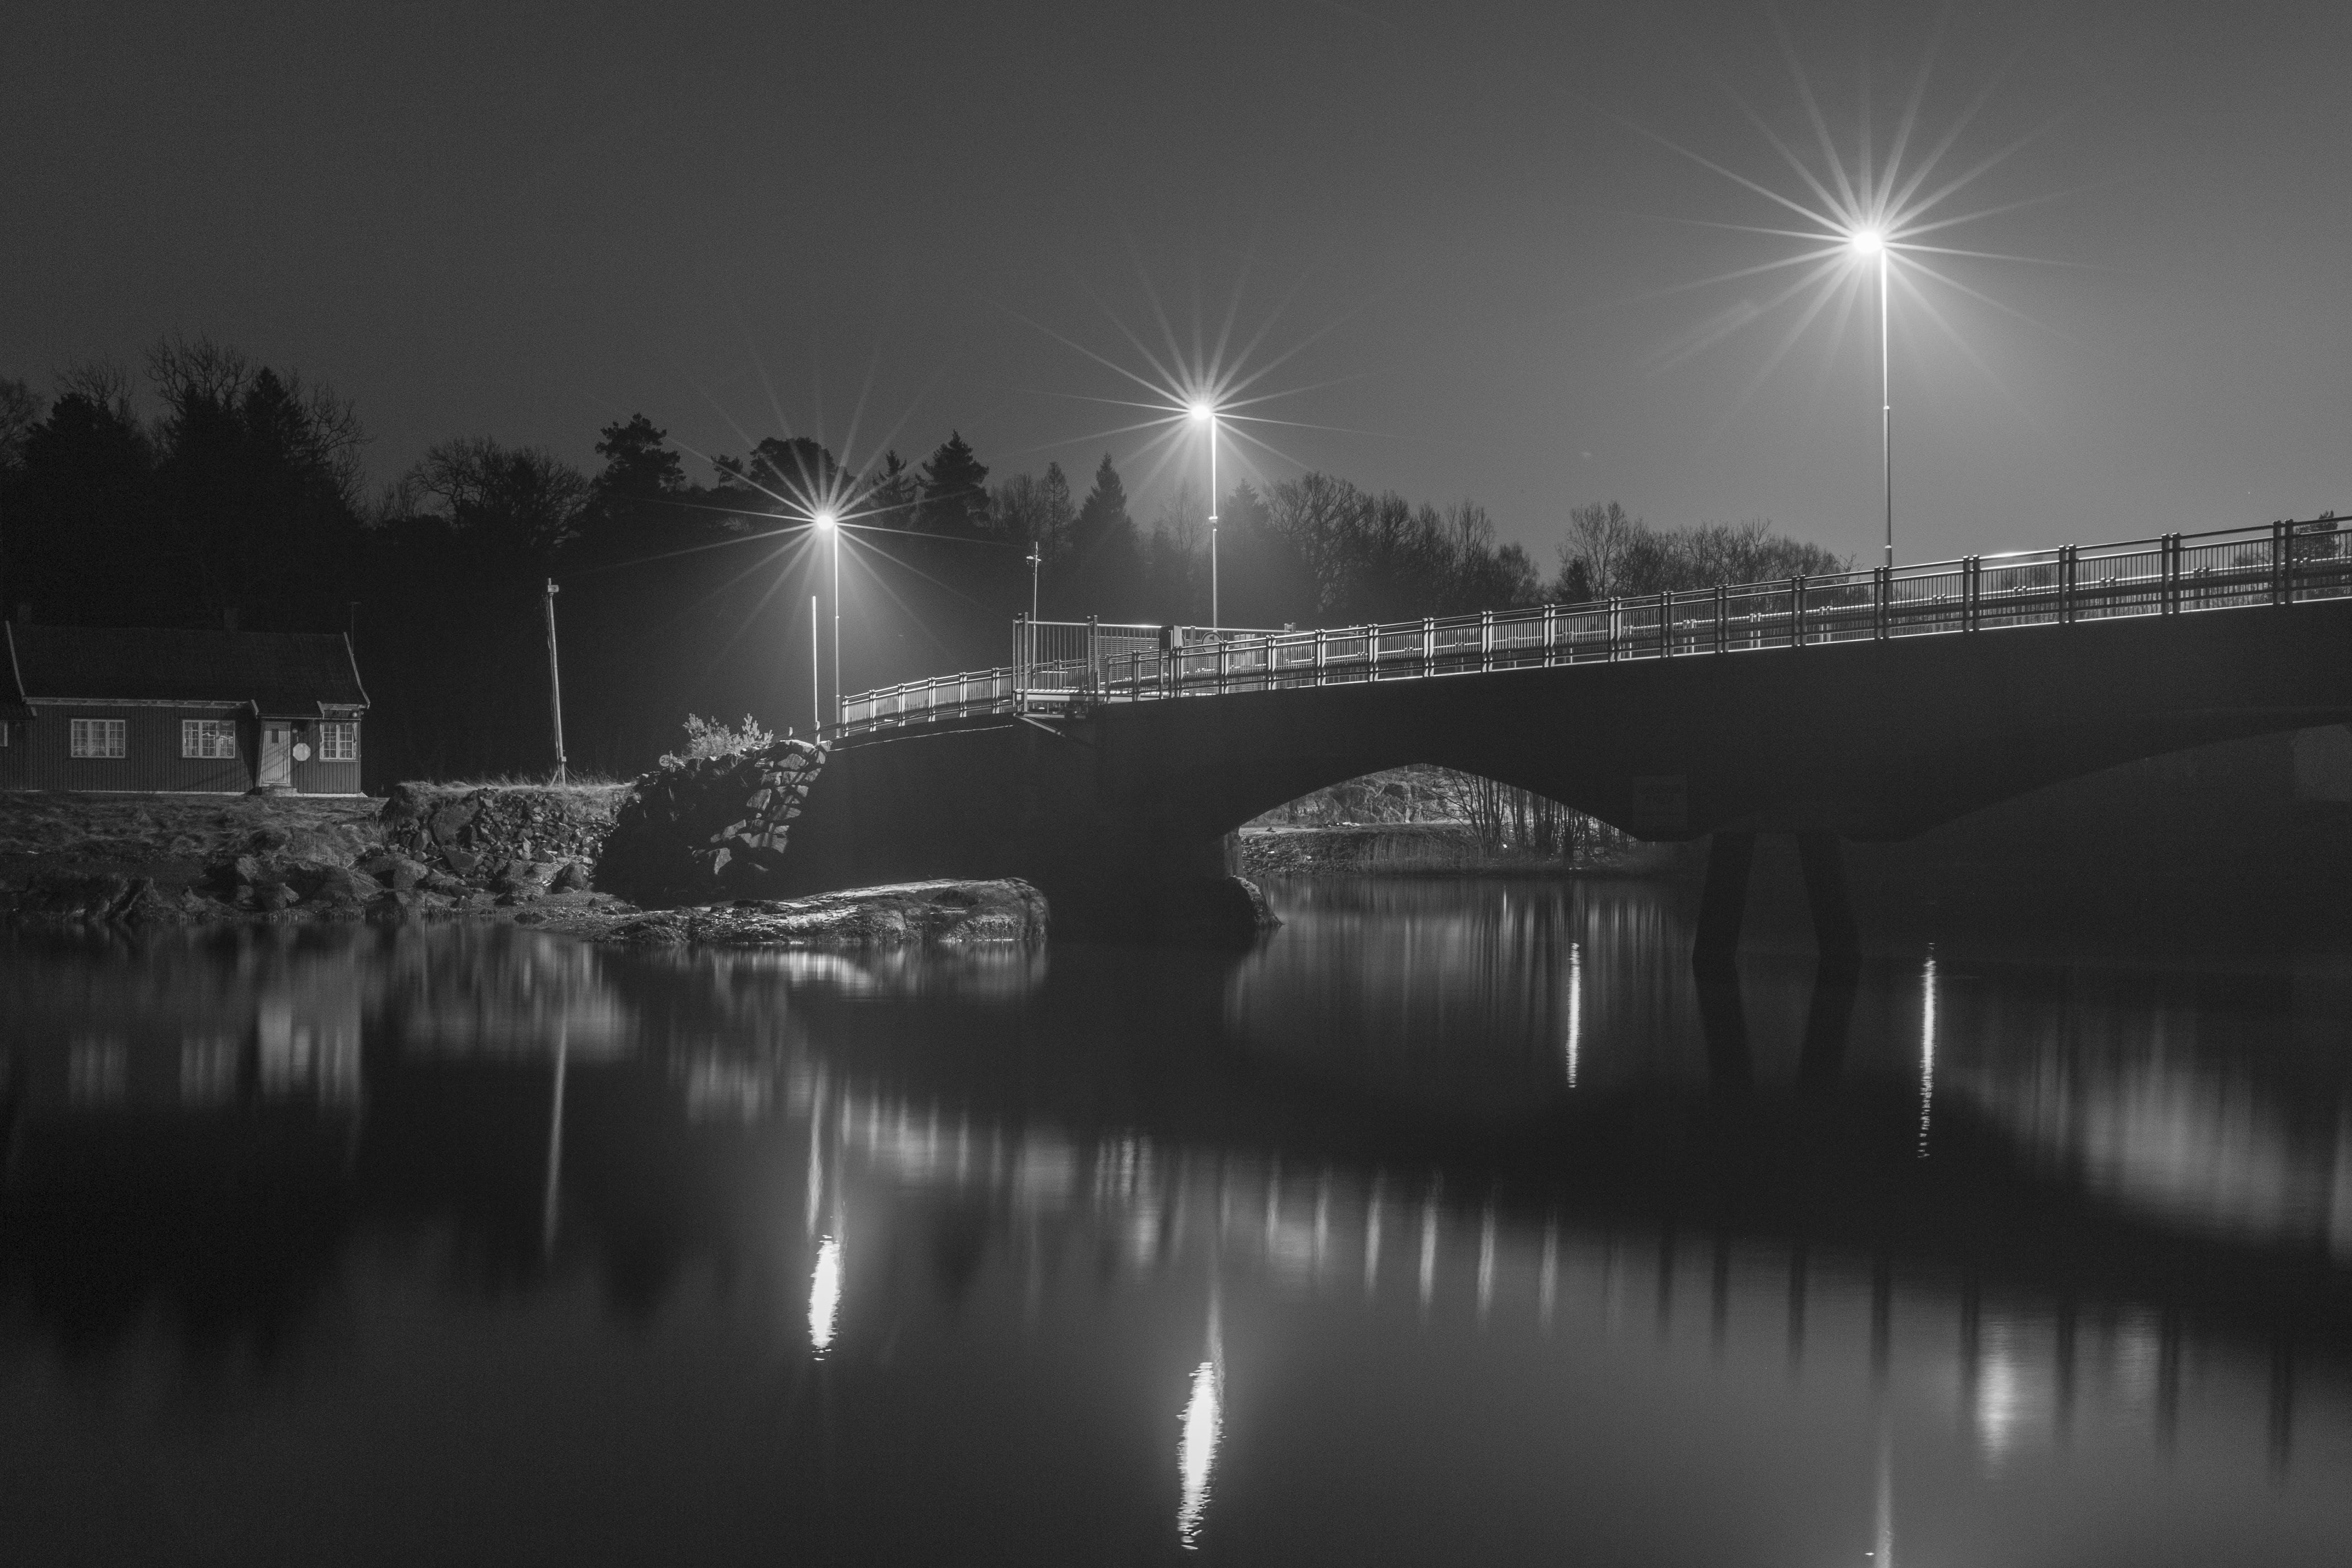 Grayscale Photo of Bridge at Night